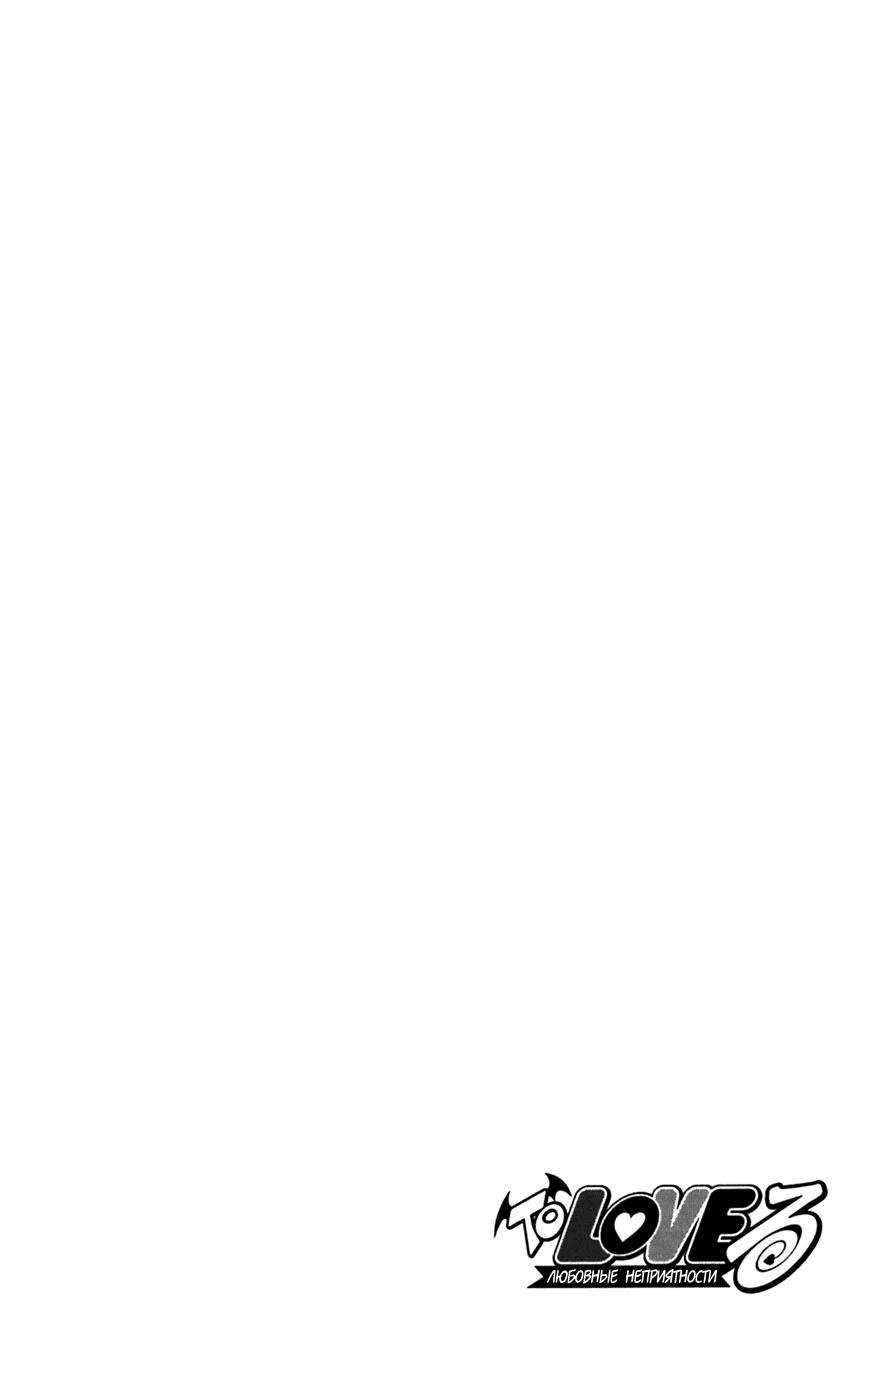 Манга Любовные неприятности / To Love-Ru  - Том 2 Глава 10 Страница 23